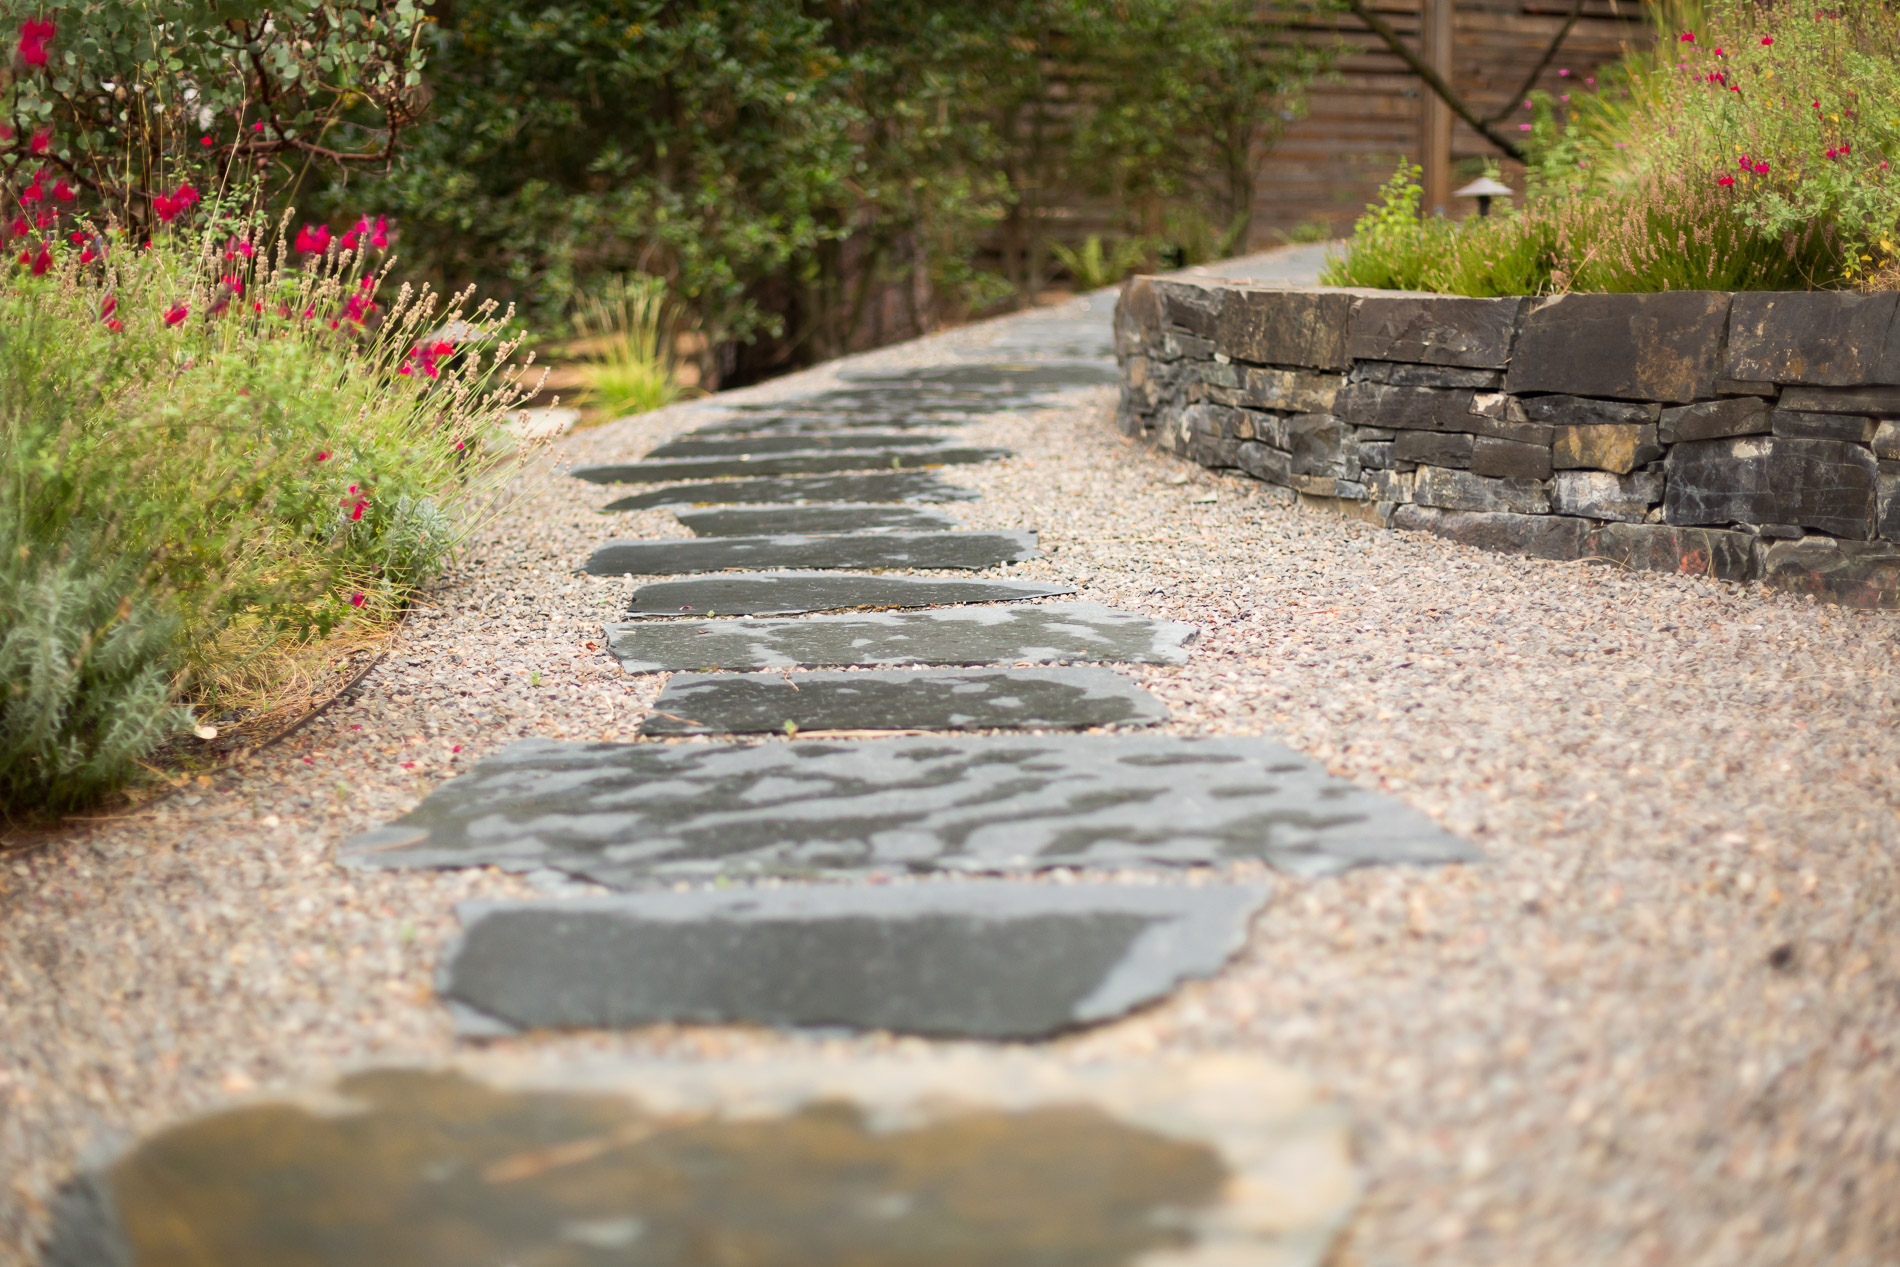 Wet Flagstone + Gravel Path + Salvia greggii 'Flame' (Red Sage)